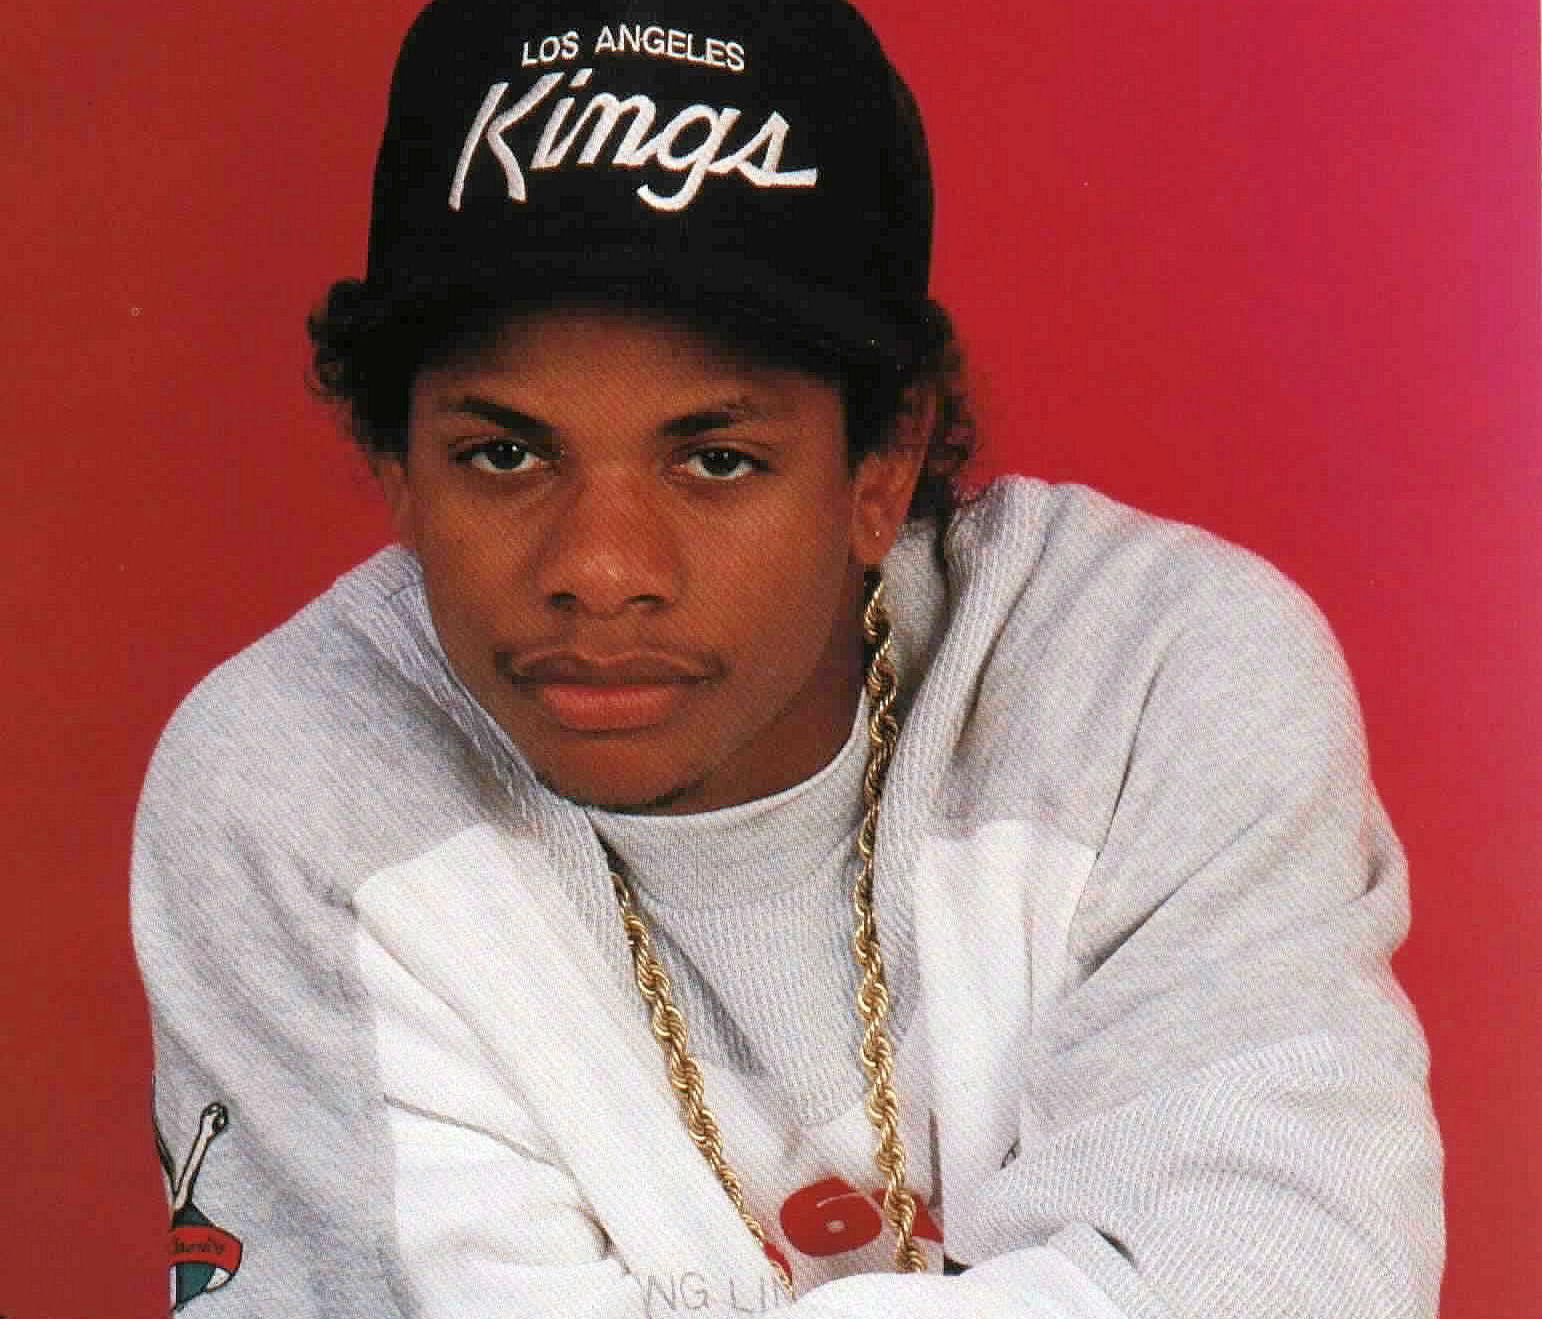 Eazy E nwa gangsta rapper rap hip hop eazy e sa wallpaper 1542x1319 1542x1319